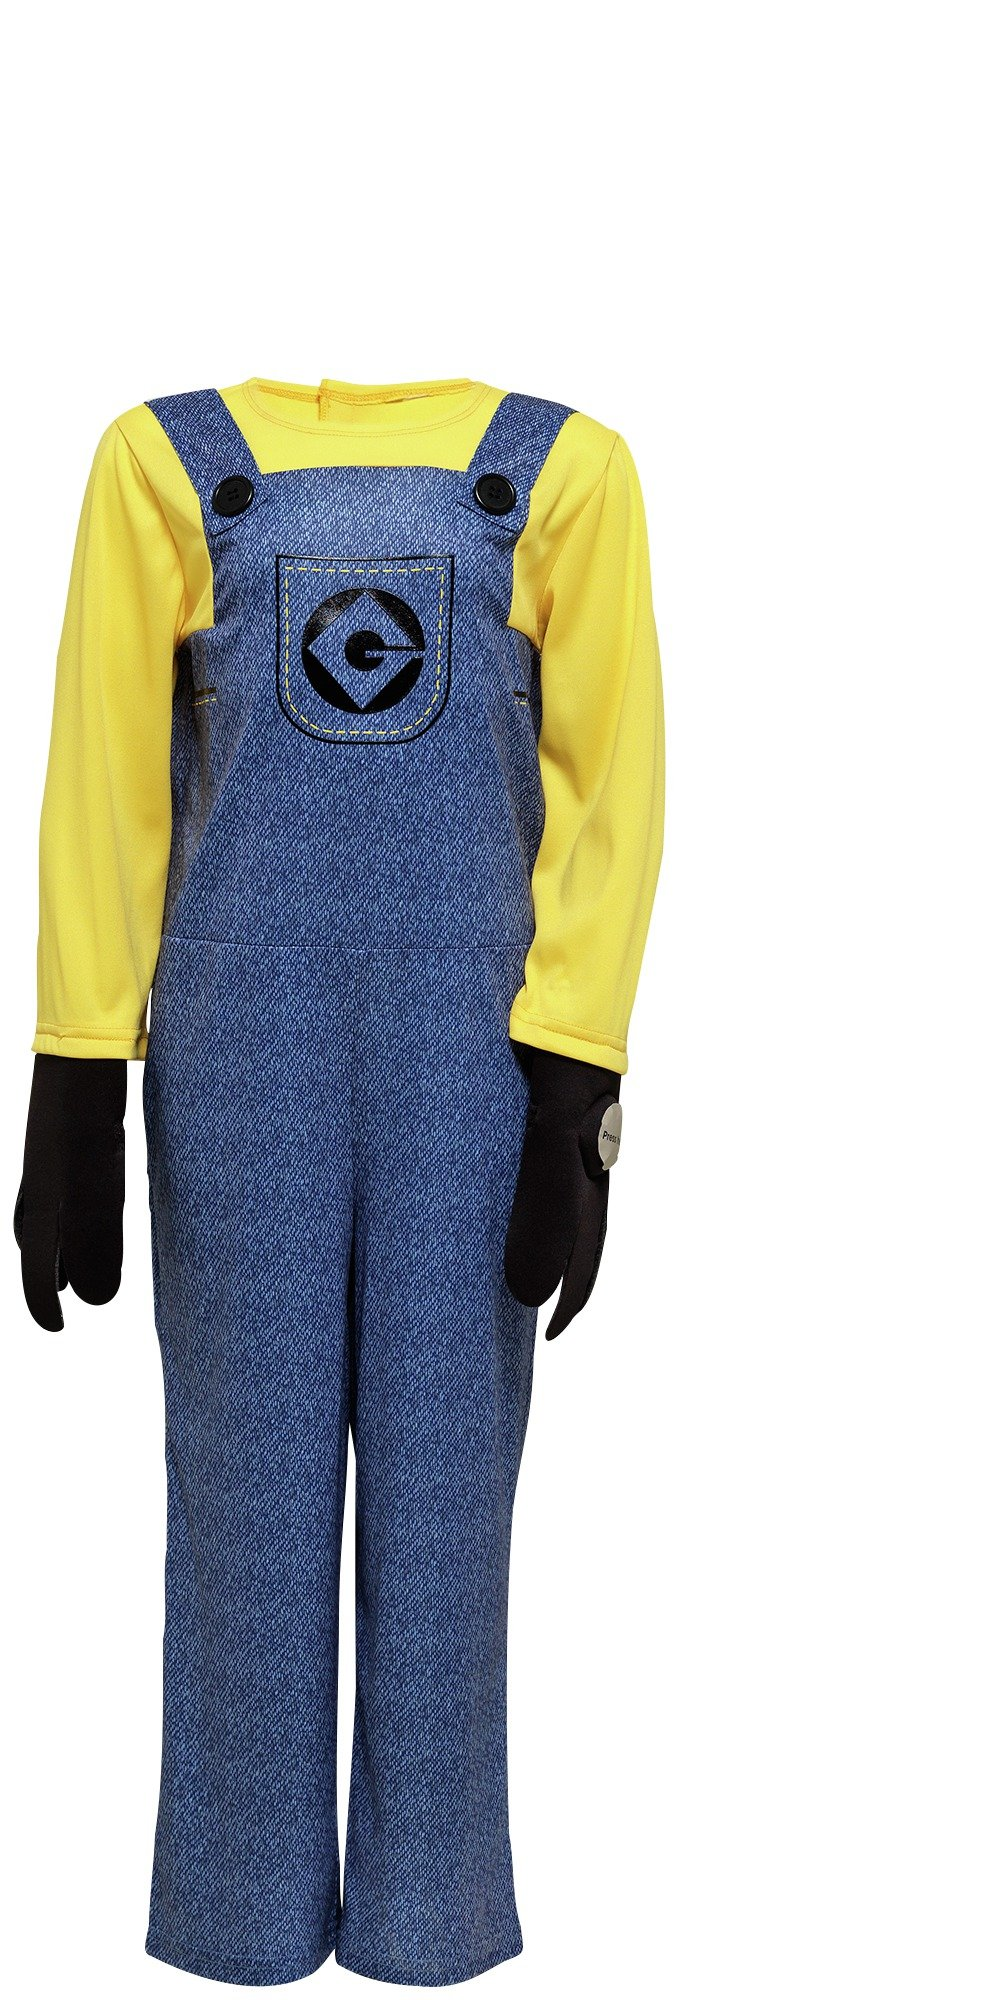 Minions Children's Fancy Dress Costume - 7-8 Years